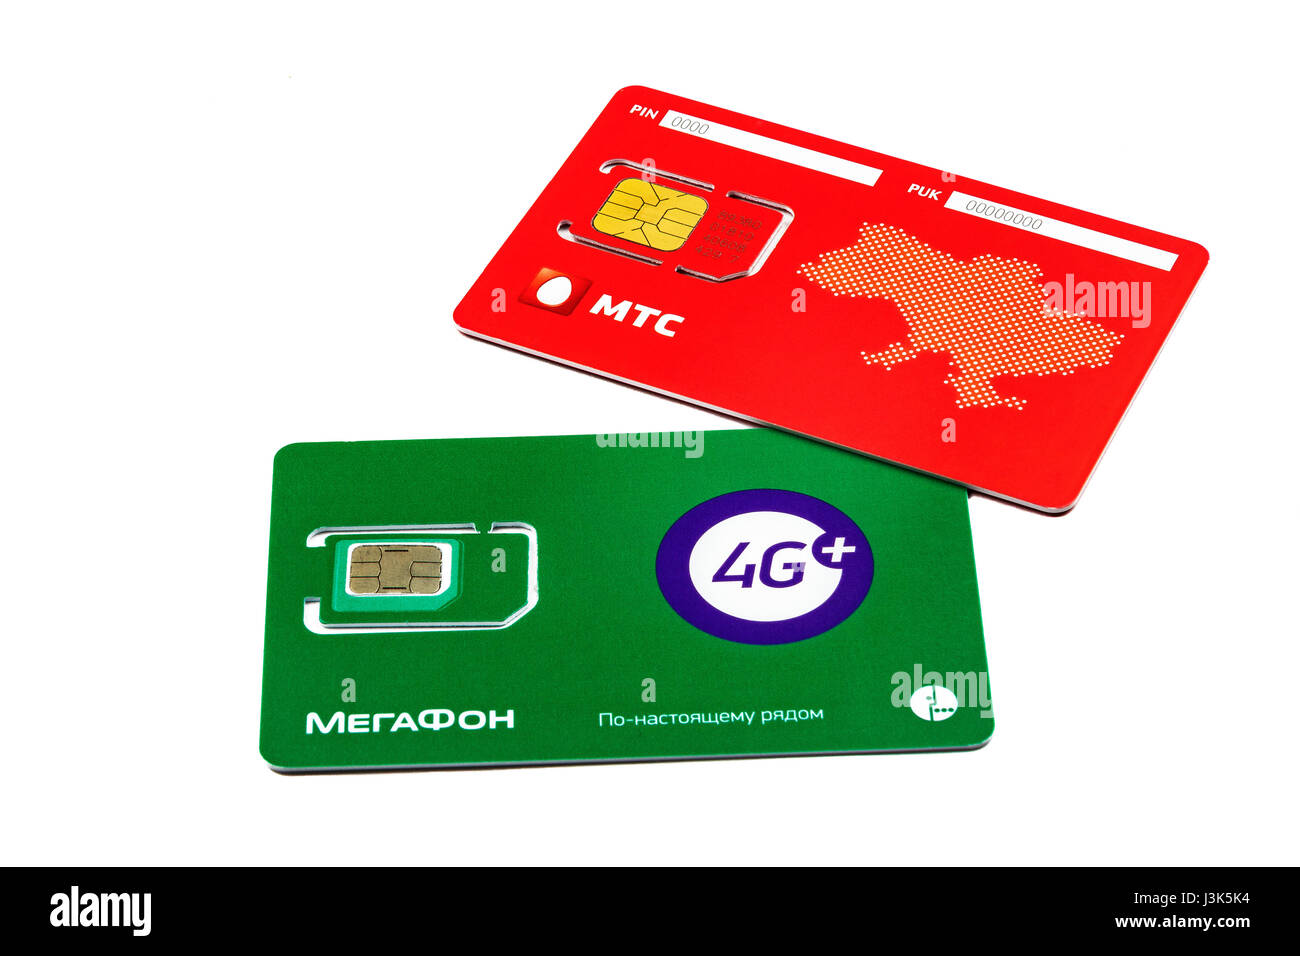 How to block a megaphone SIM card: 3 ways 15